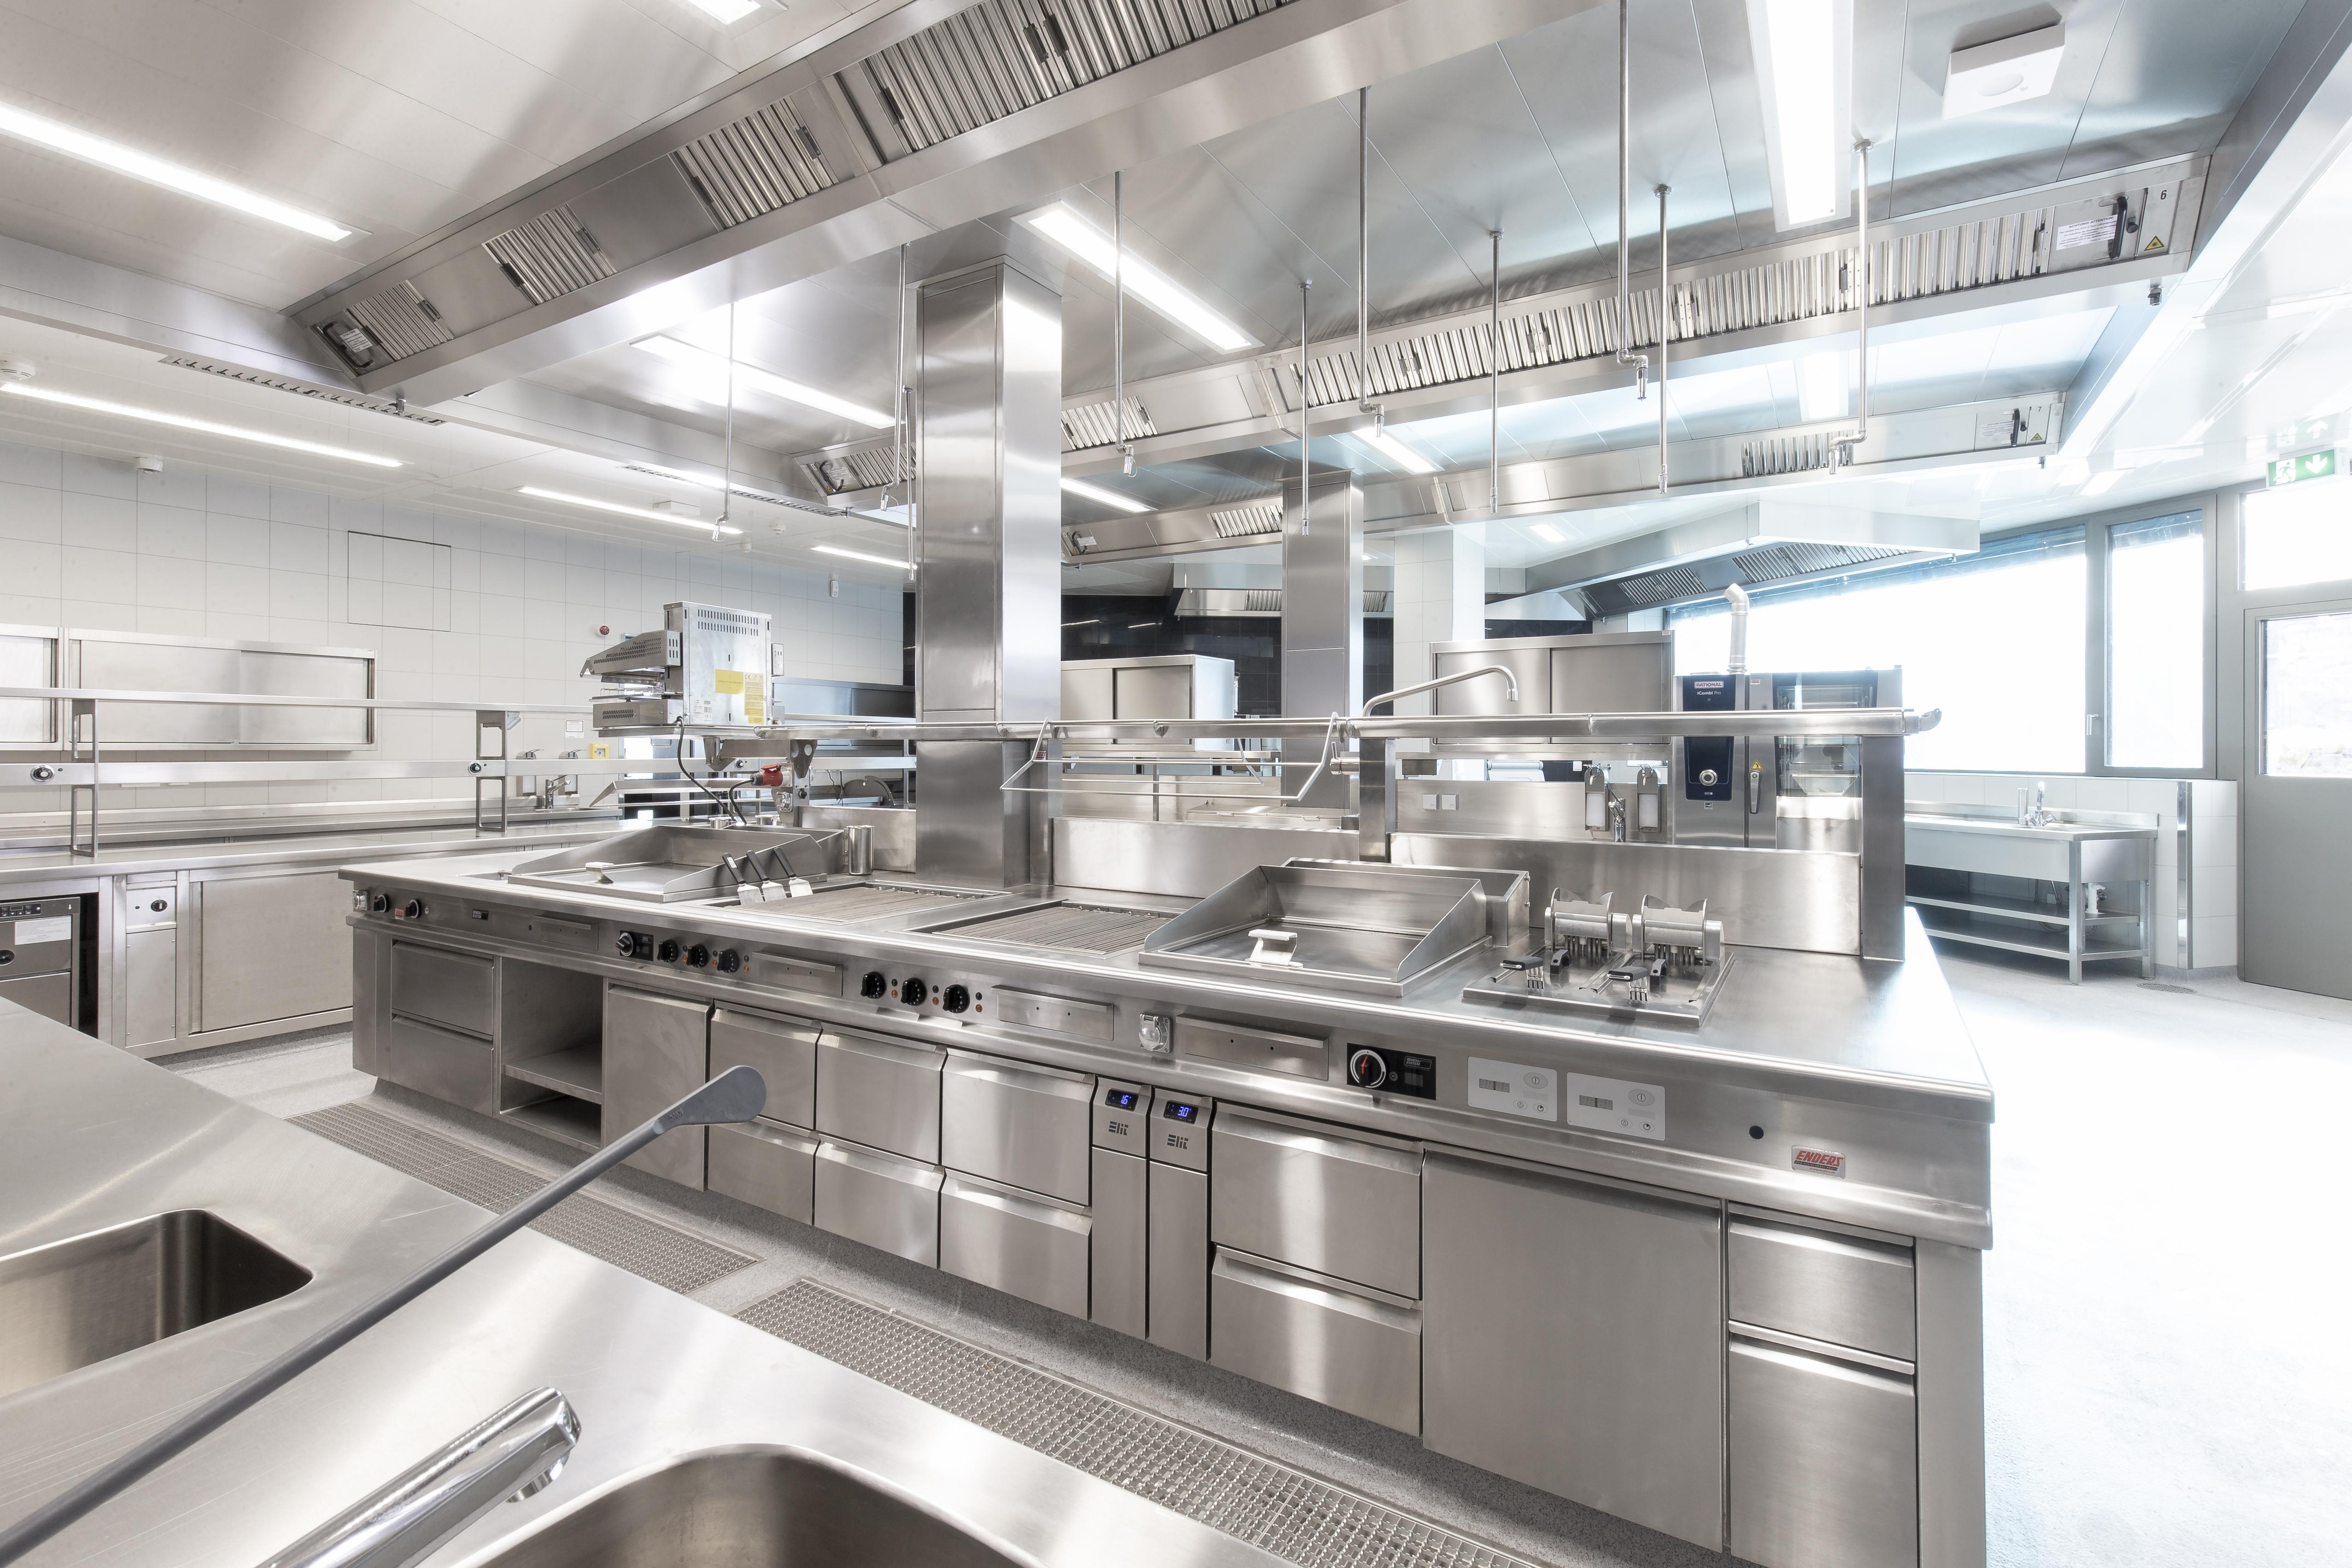 Produktionsbereich Grossküche Restaurant Knossos